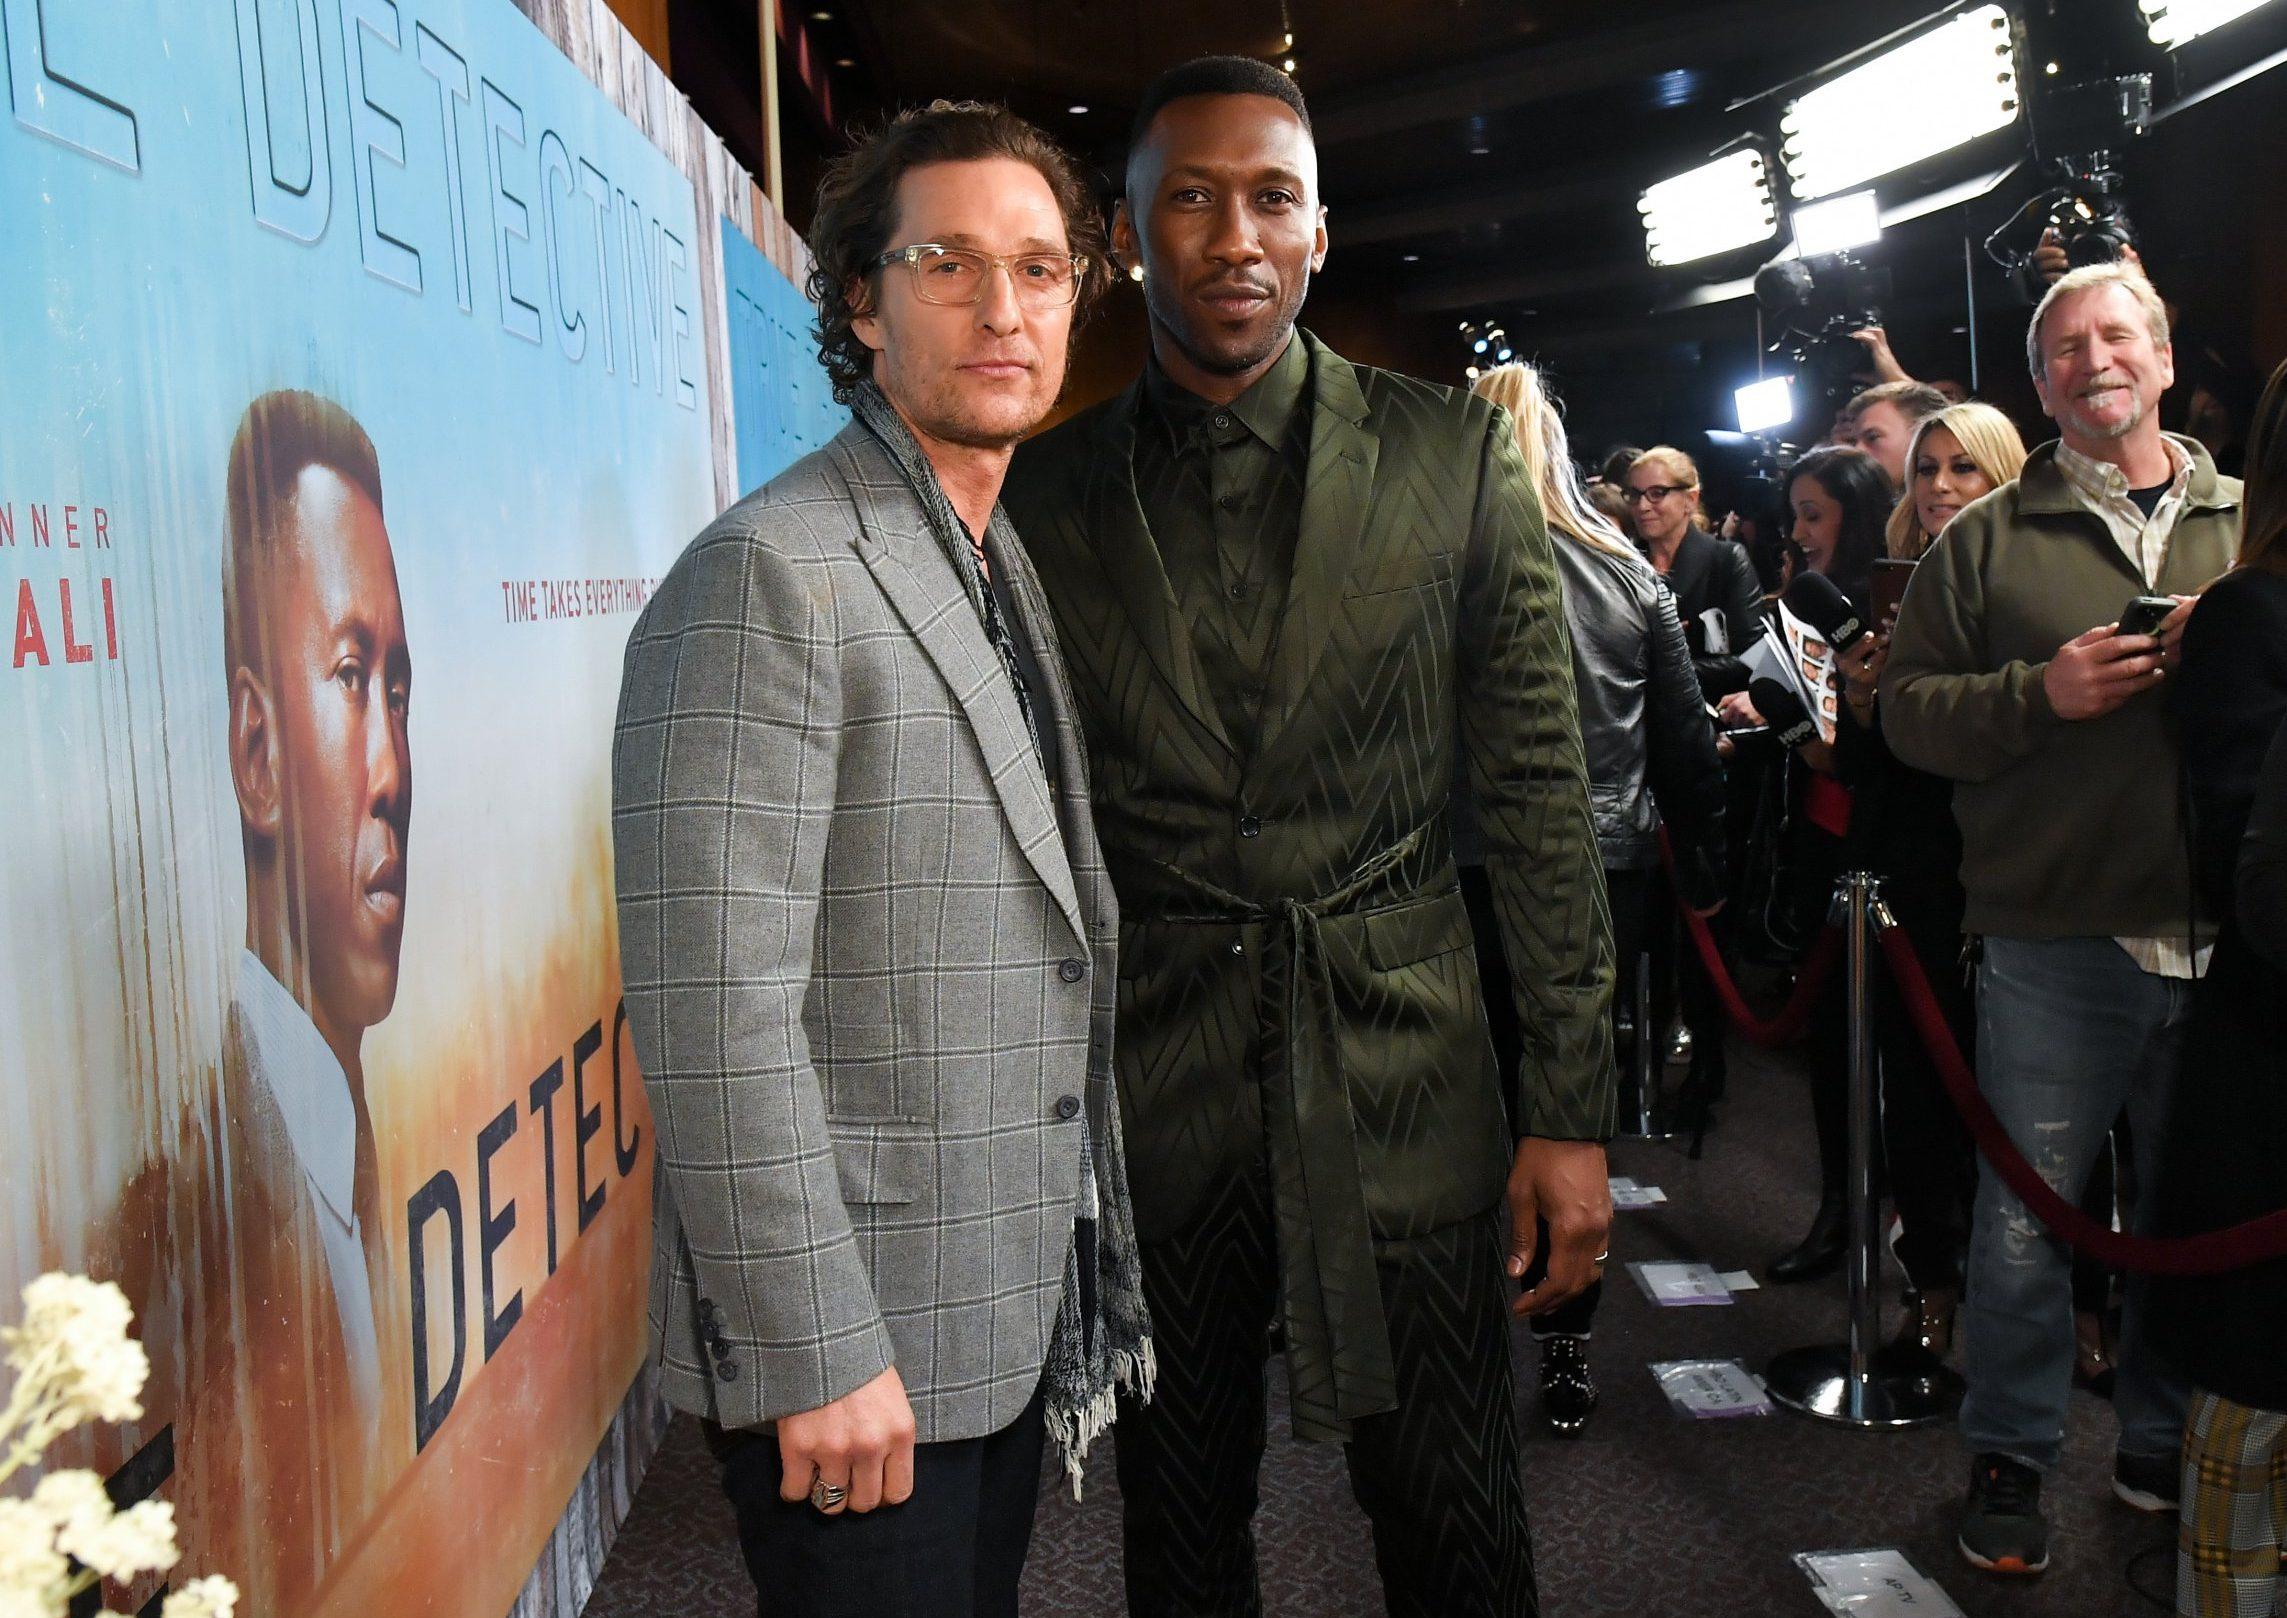 Matthew McConaughey supports Mahershala Ali at True Detective season 3 premiere